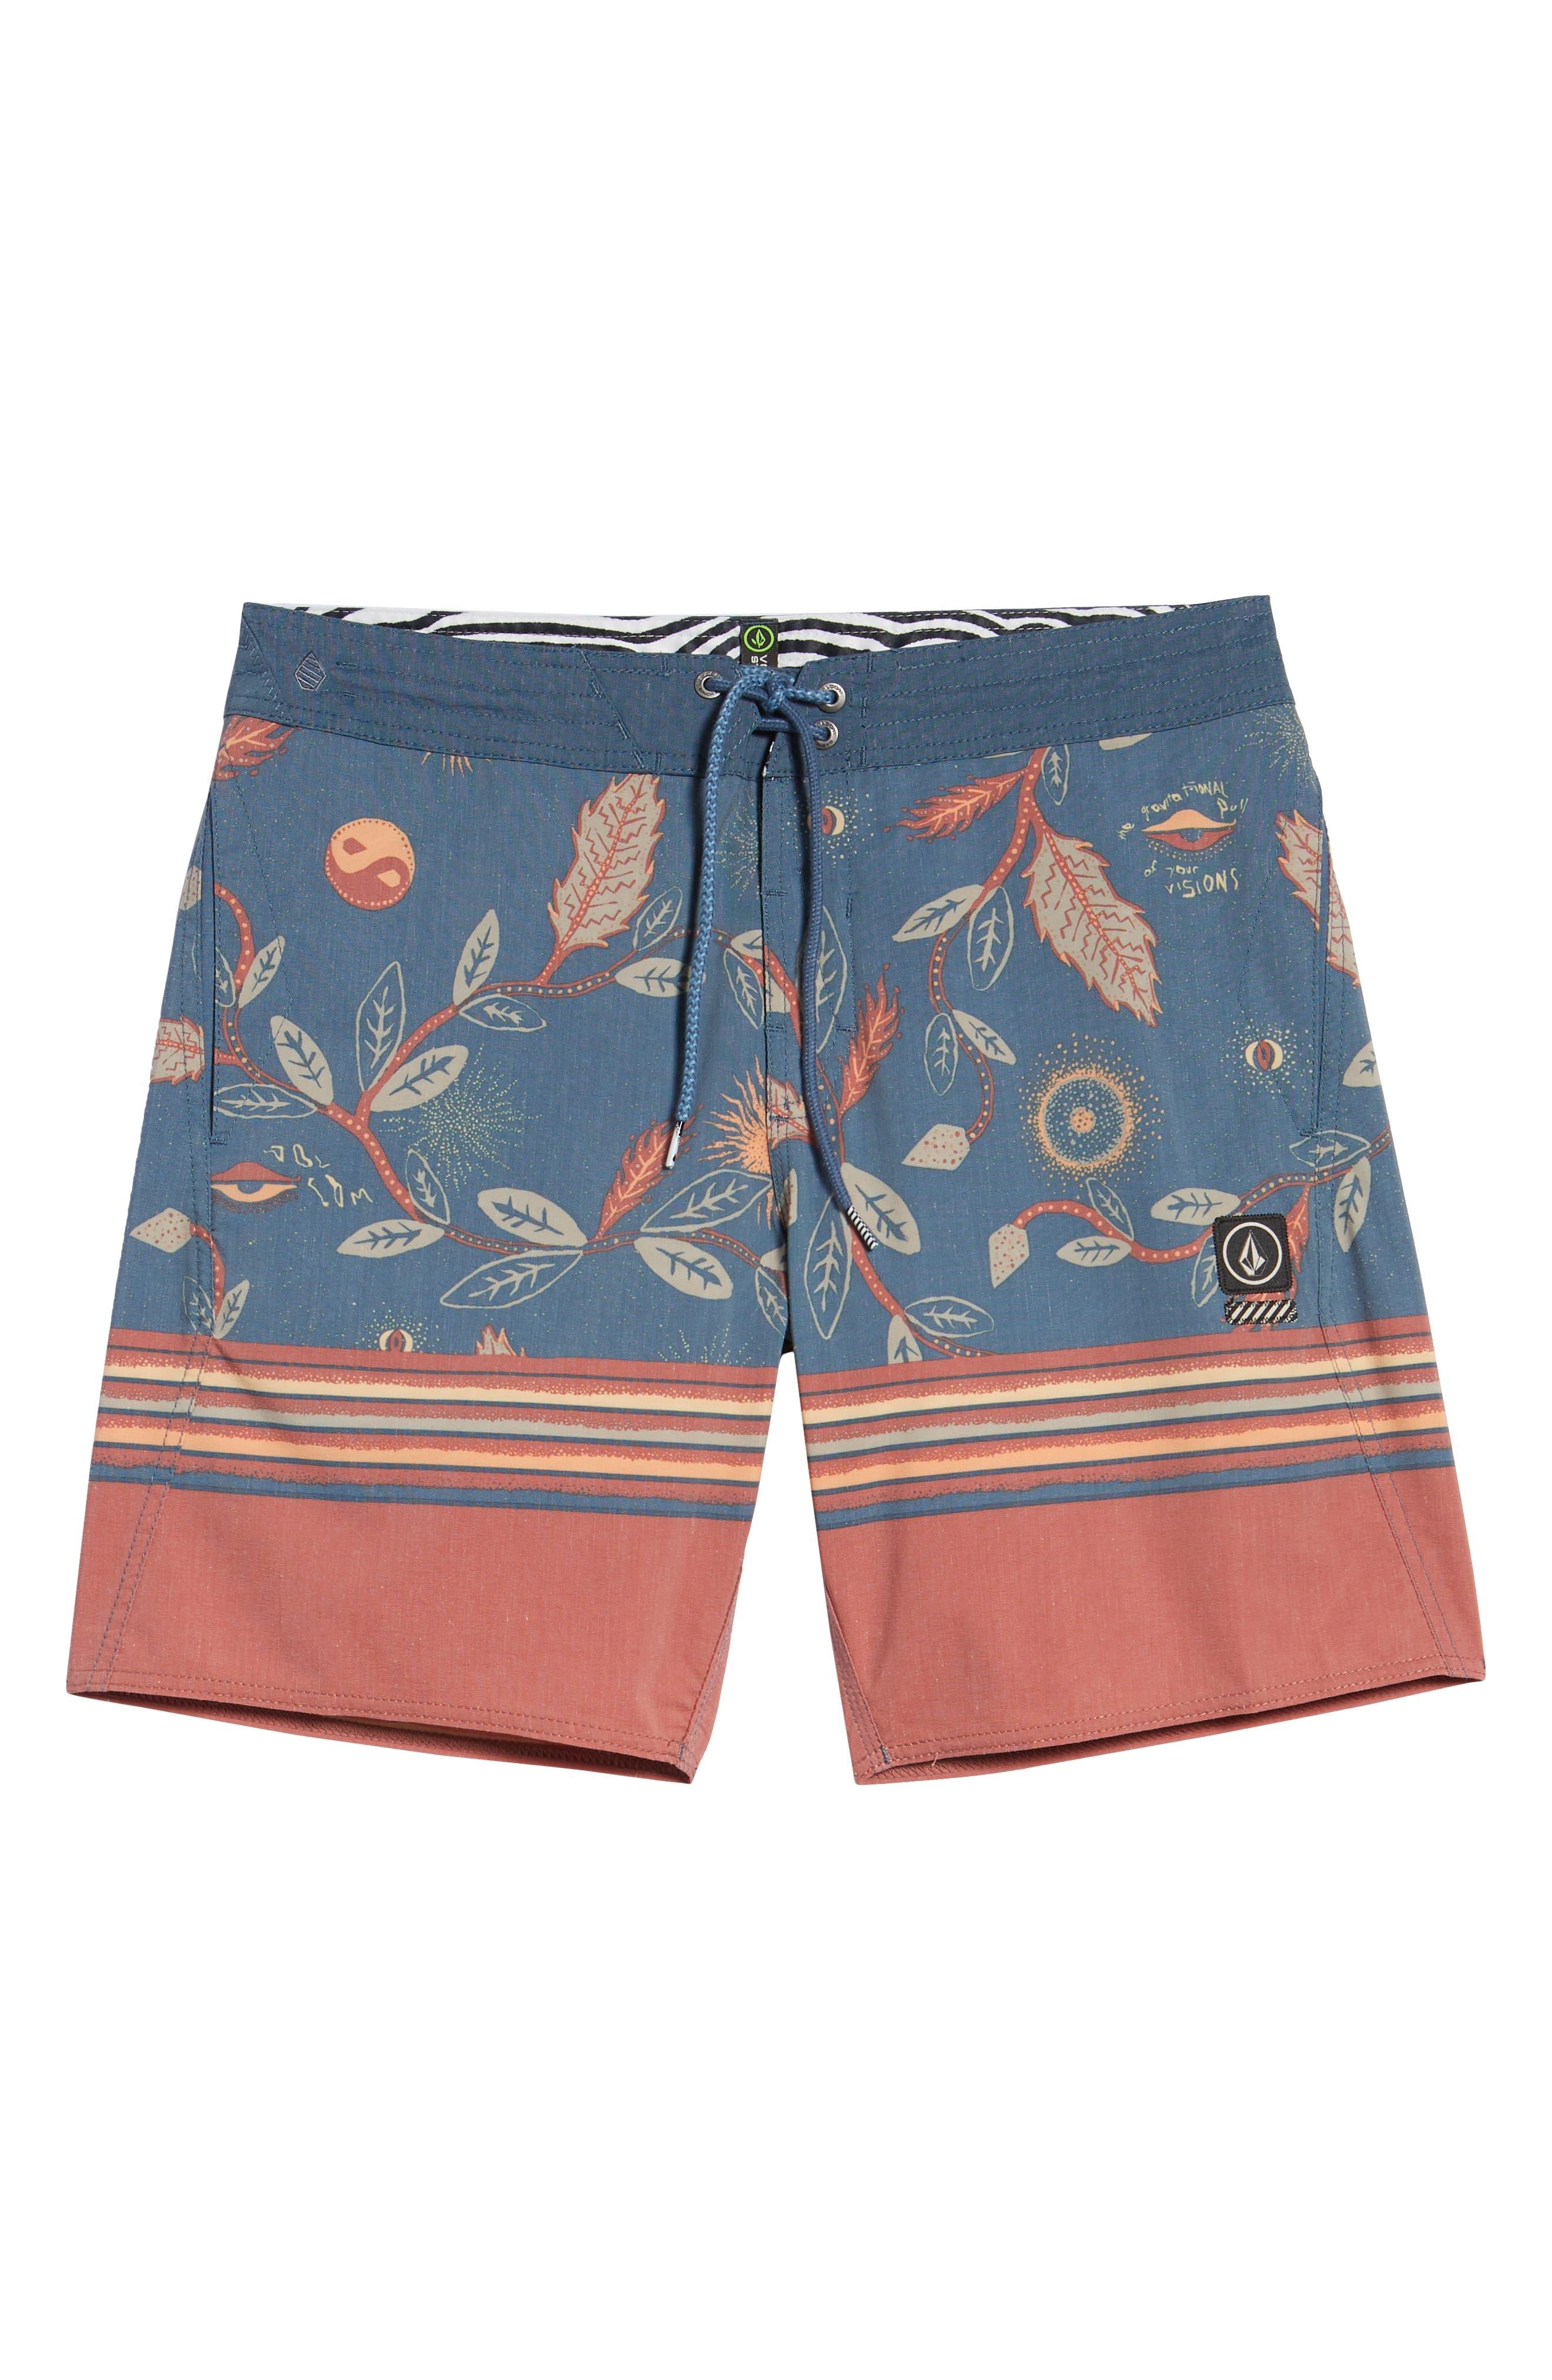 VOLCOM,                             Lucid Stoney Board Shorts,                             Alternate thumbnail 6, color,                             463